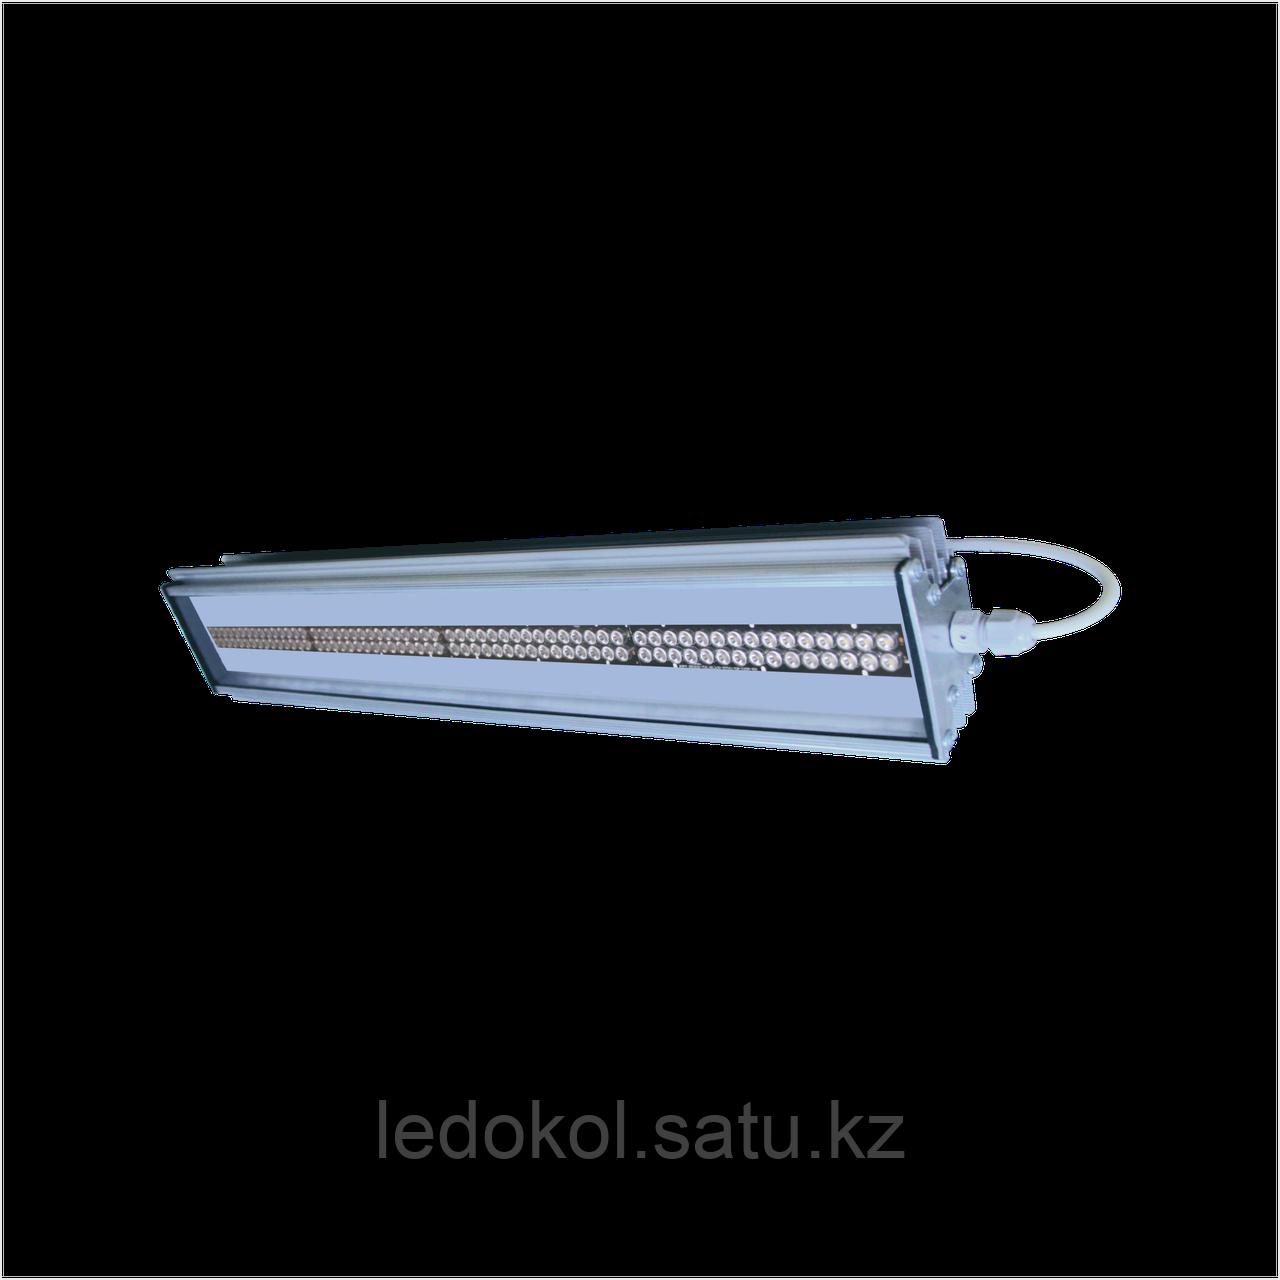 Прожектор 200W серии Спорт-Линзы